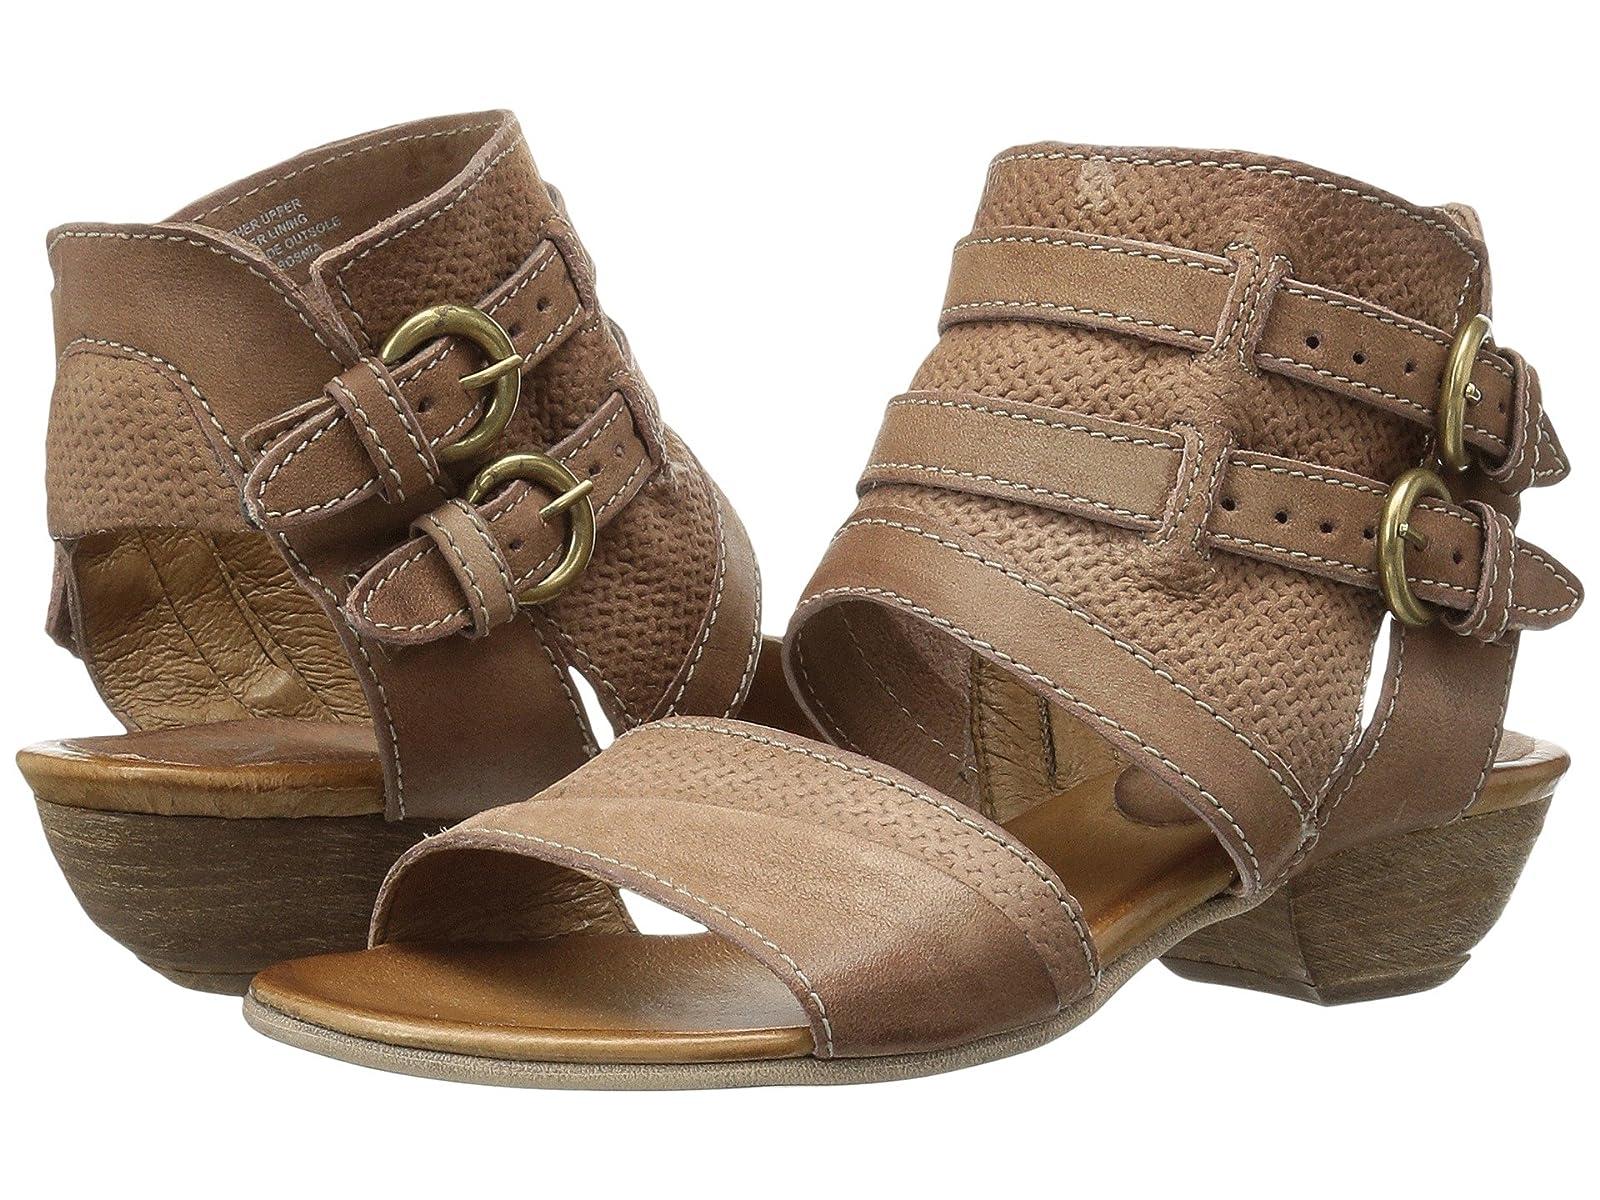 Miz Mooz CyrusCheap and distinctive eye-catching shoes